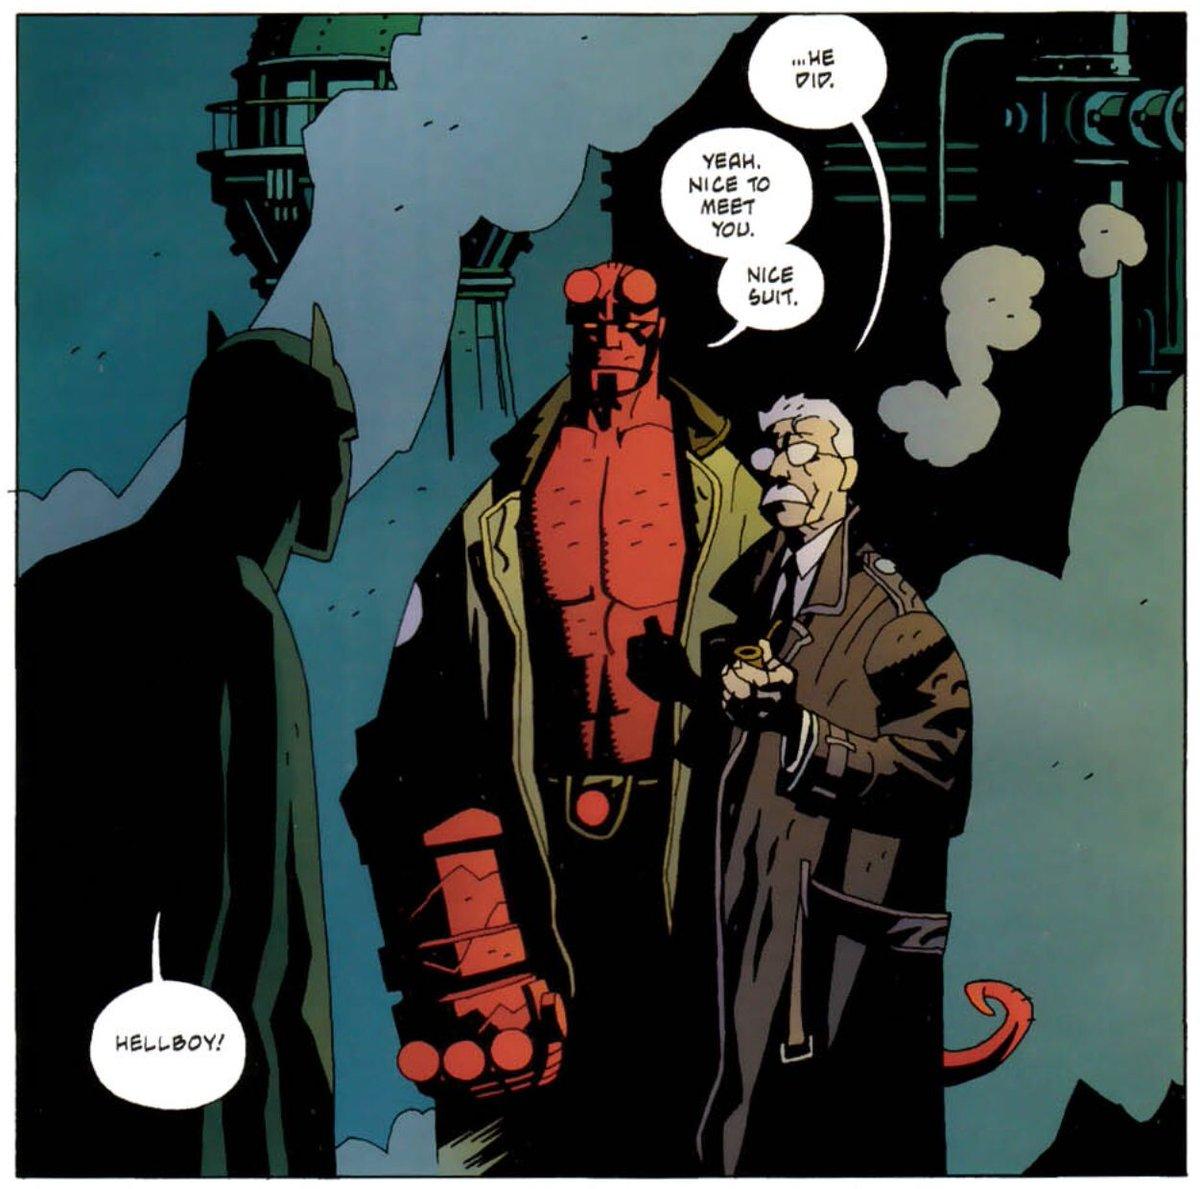 Easy.  #Hellboy #Batman & #Starman https://twitter.com/selinakravitz/status/1229595572472078337…pic.twitter.com/aH5EzUcG4o